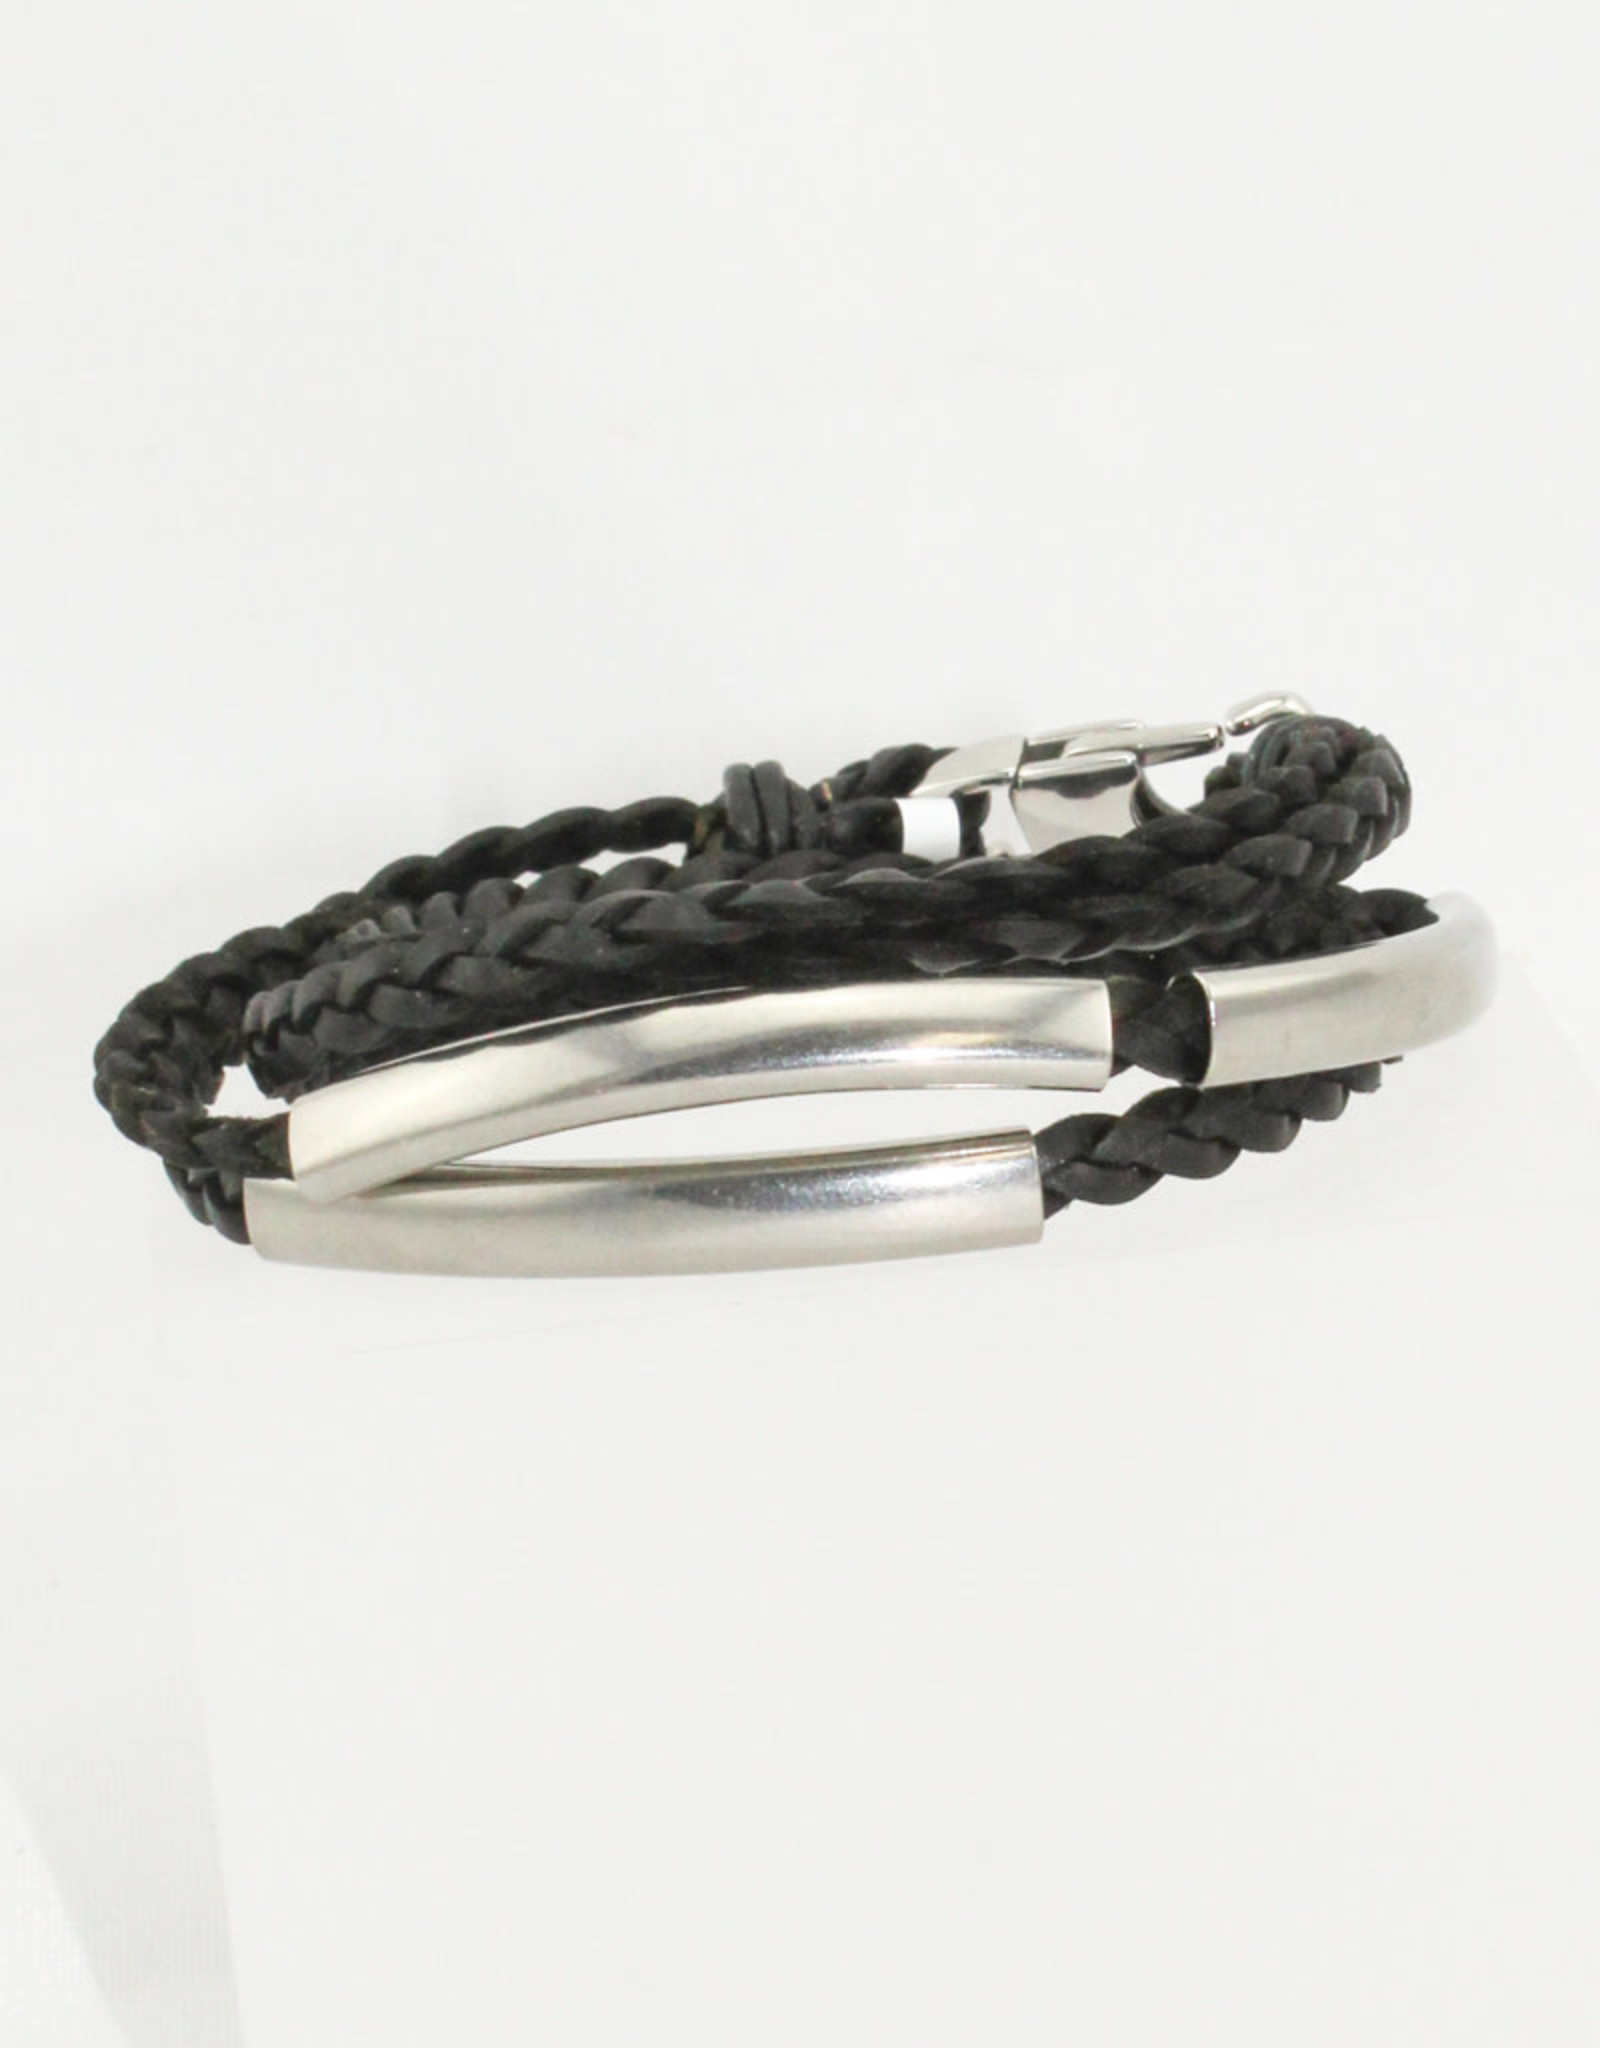 Lizzy James Mini Aiden-Nat Black-2-SS-L Bracelet